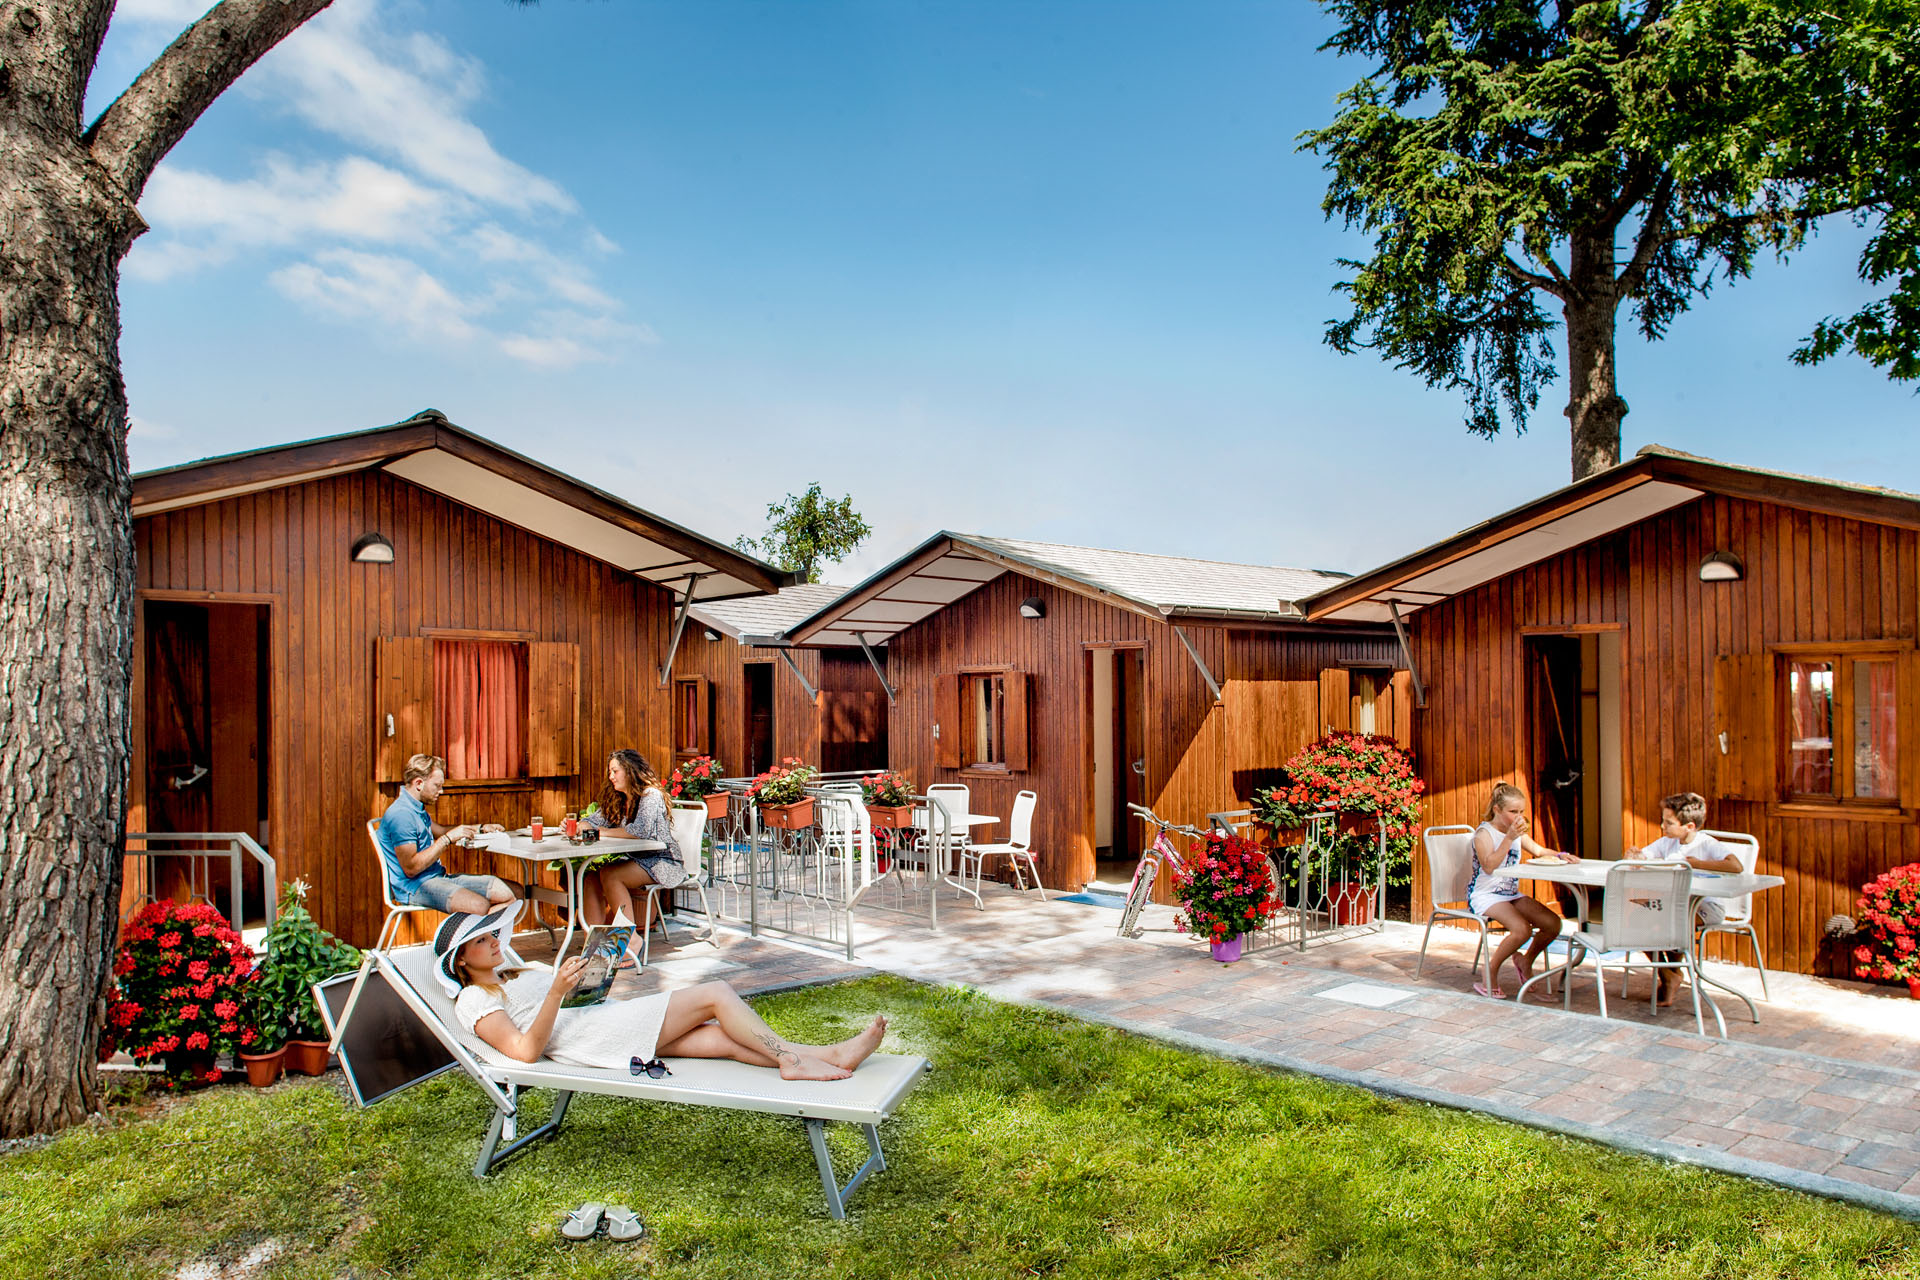 Liguria camping bungalows chalet riviera dei fiori campeggio for Planimetrie dei bungalow spagnoli